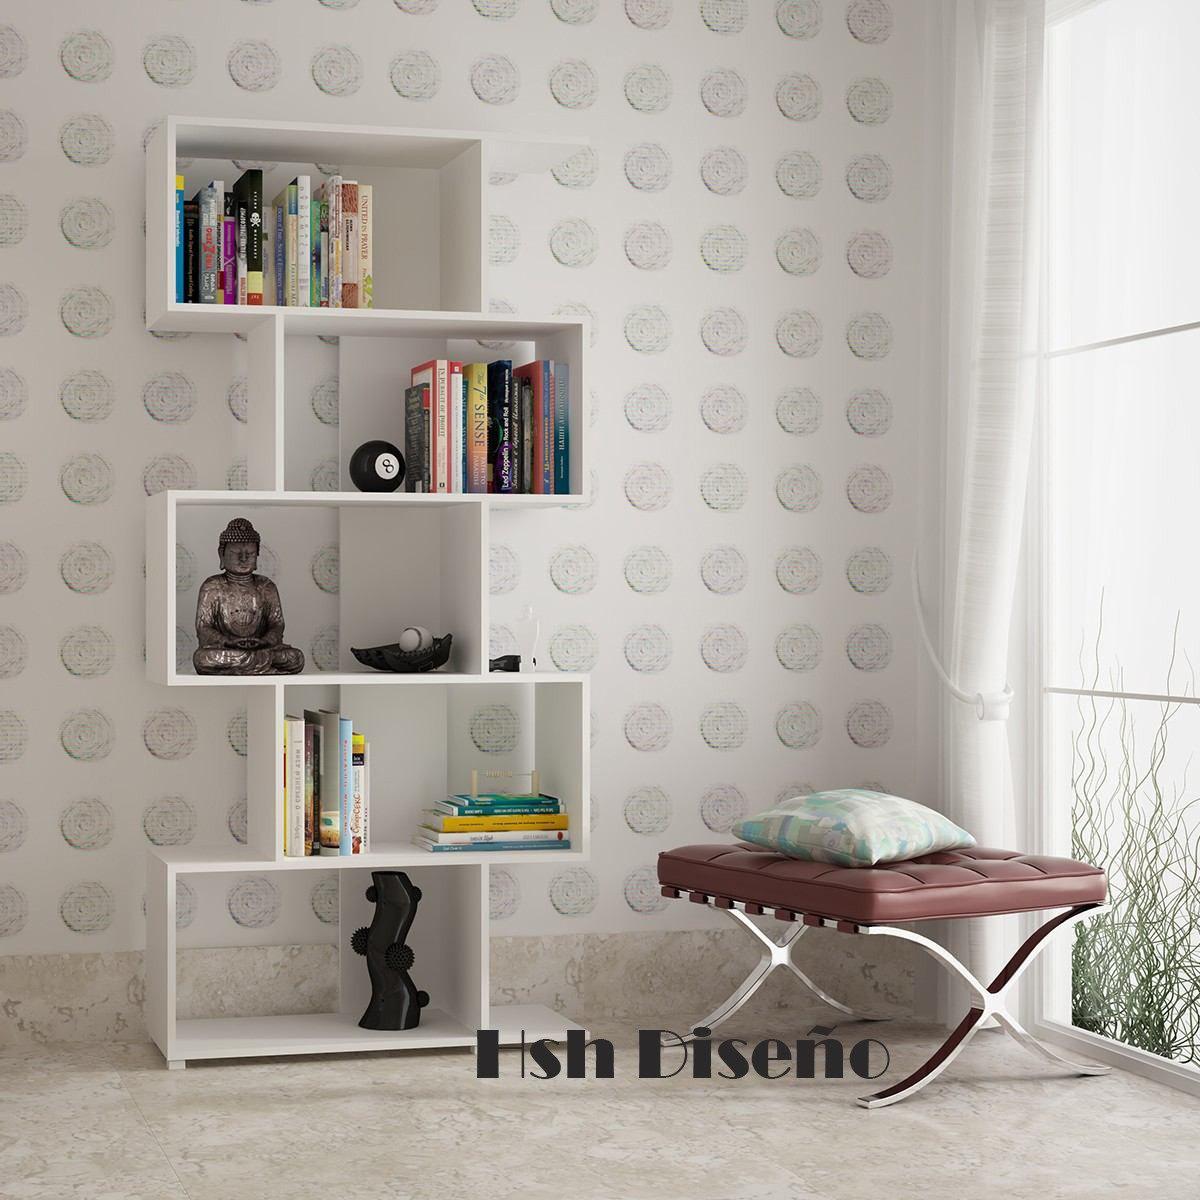 Biblioteca Mueble Minimalista Moderno Living Decoraci N 2 280  # Muebles Bibliotecas Para Living